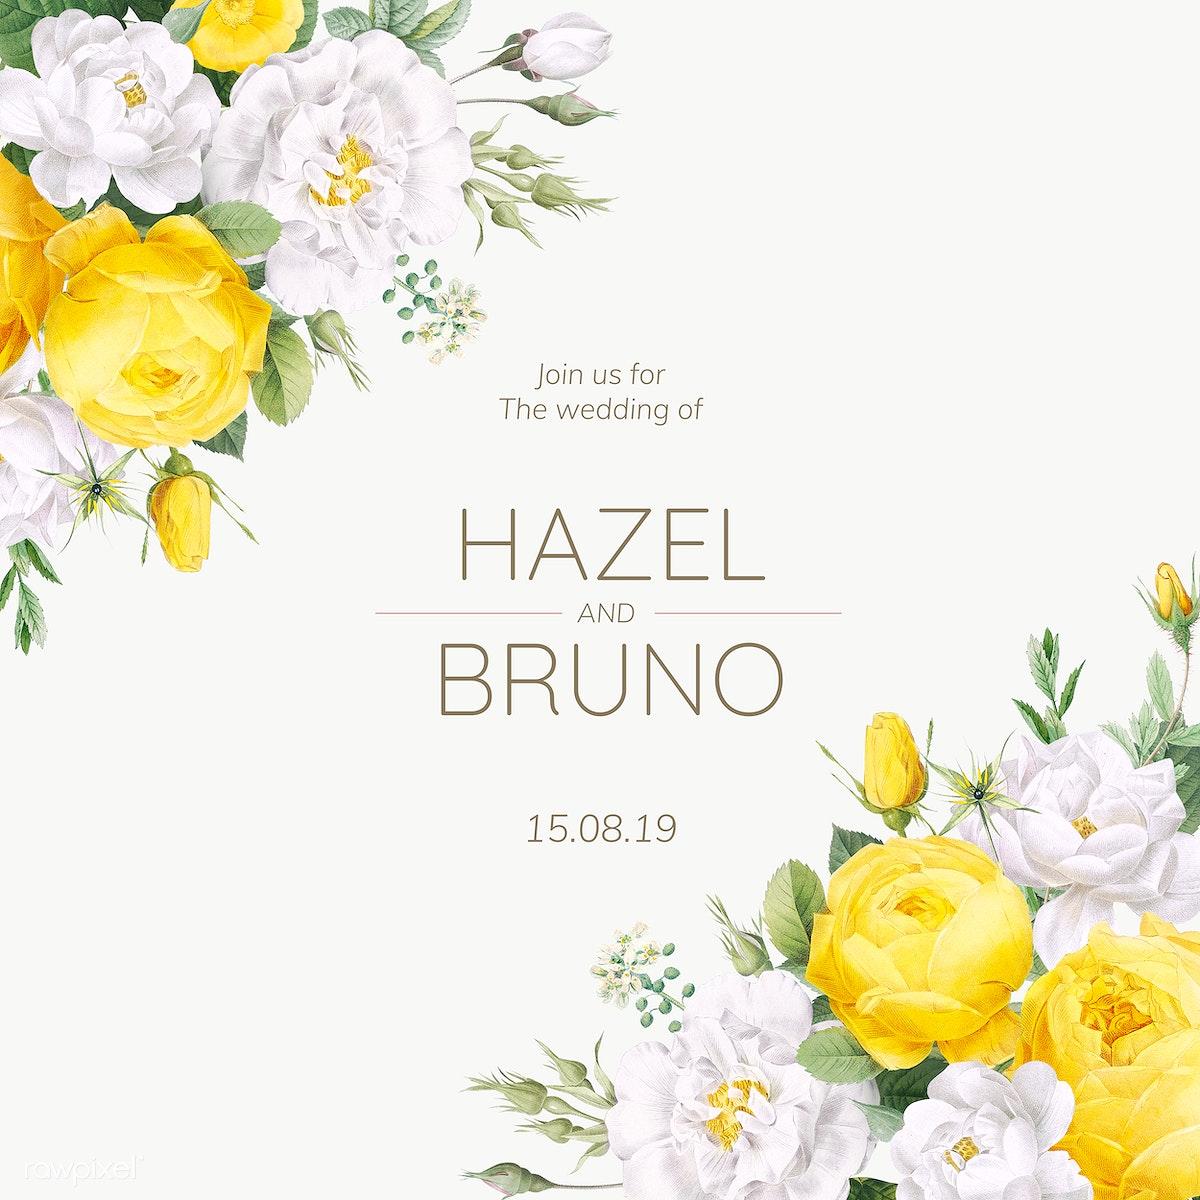 floral design wedding invitation  royalty free